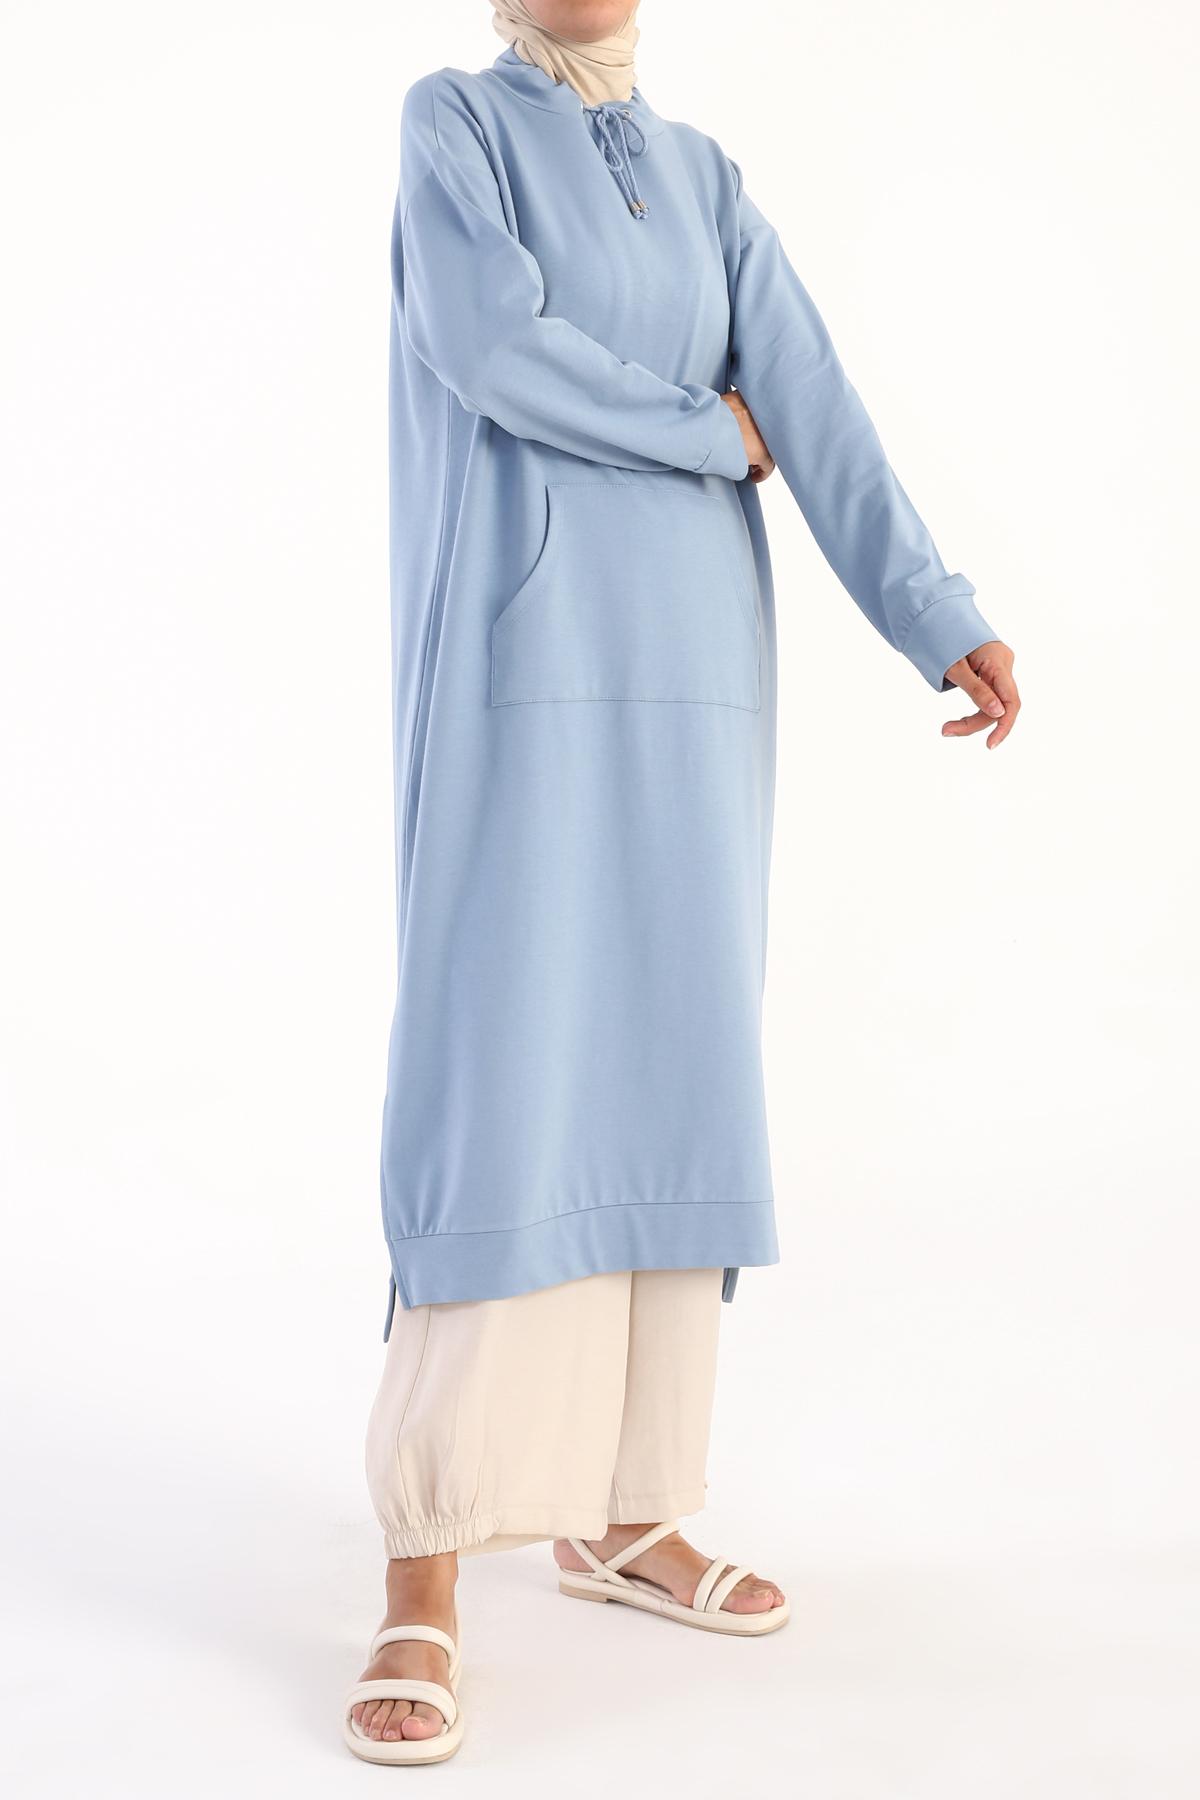 Kangoroo Pocket Hem Slit Cotton Dress Tunic